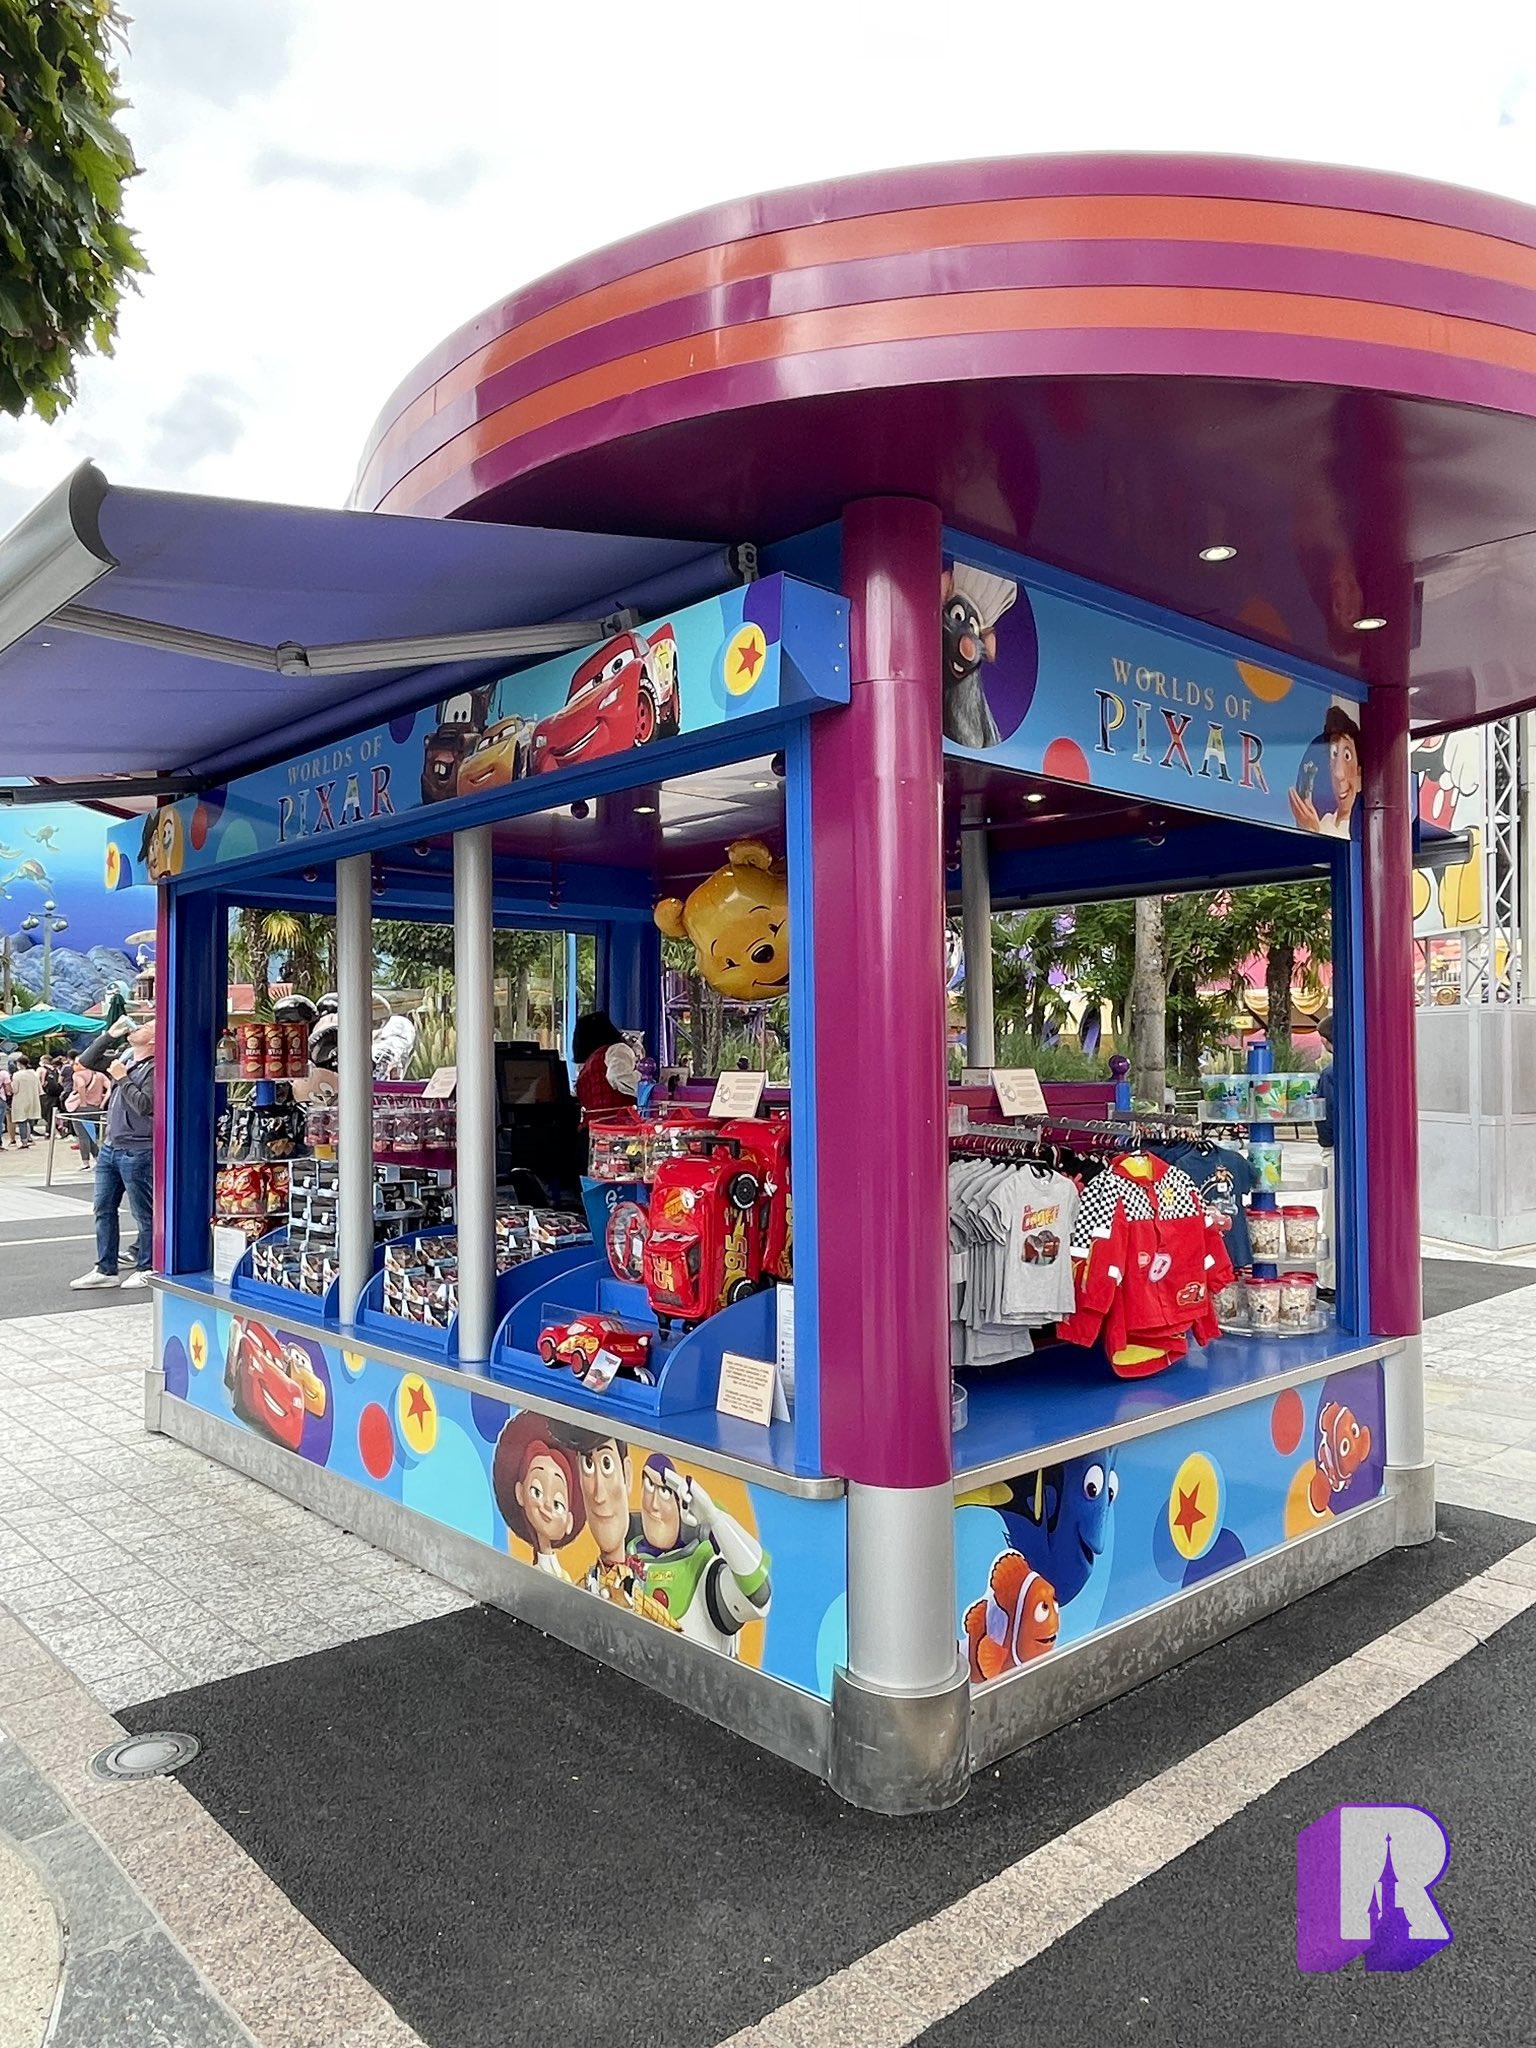 2021 - World of Pixar E9zkgs11